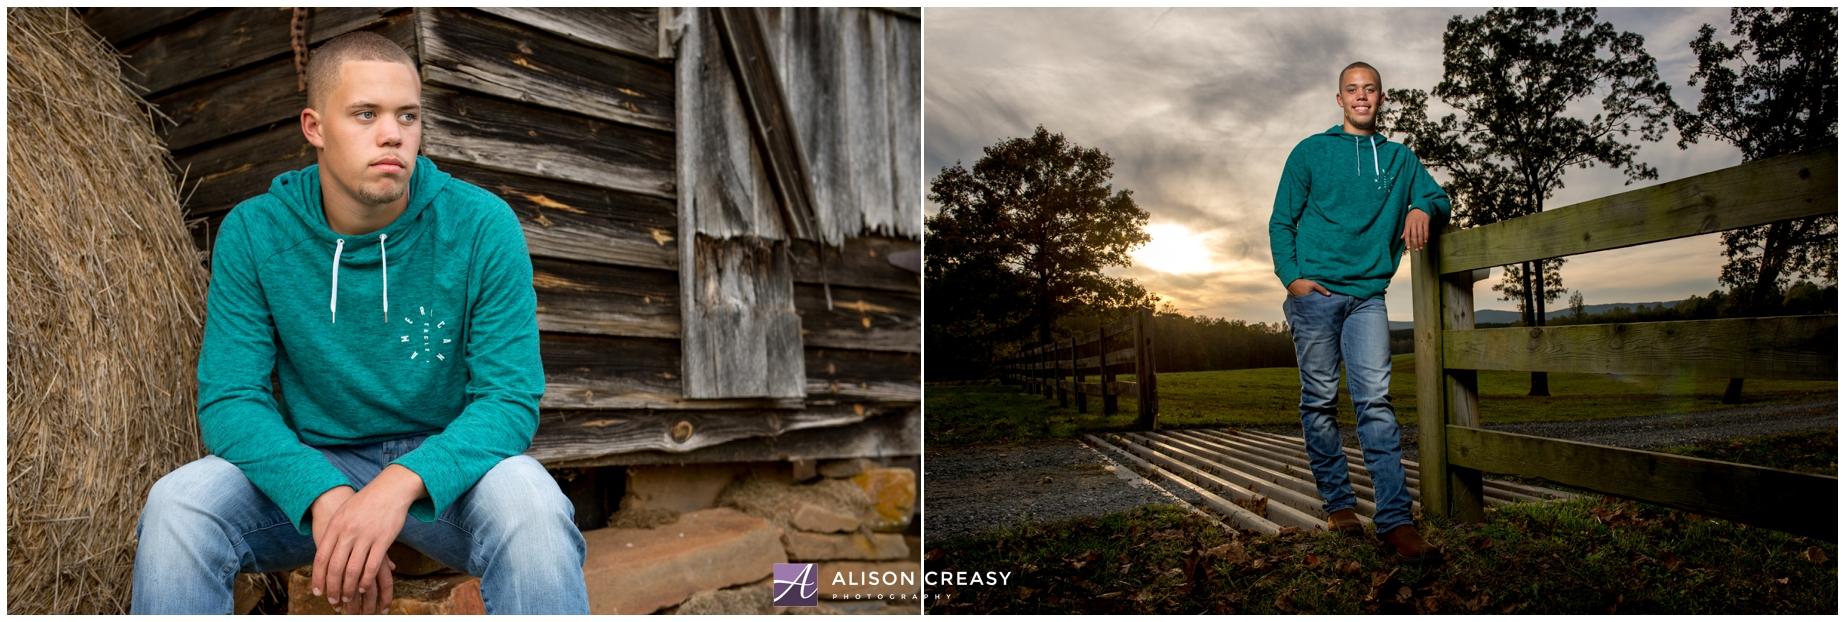 Alison-Creasy-Photography-Lynchburg-VA-Photographer_0931.jpg